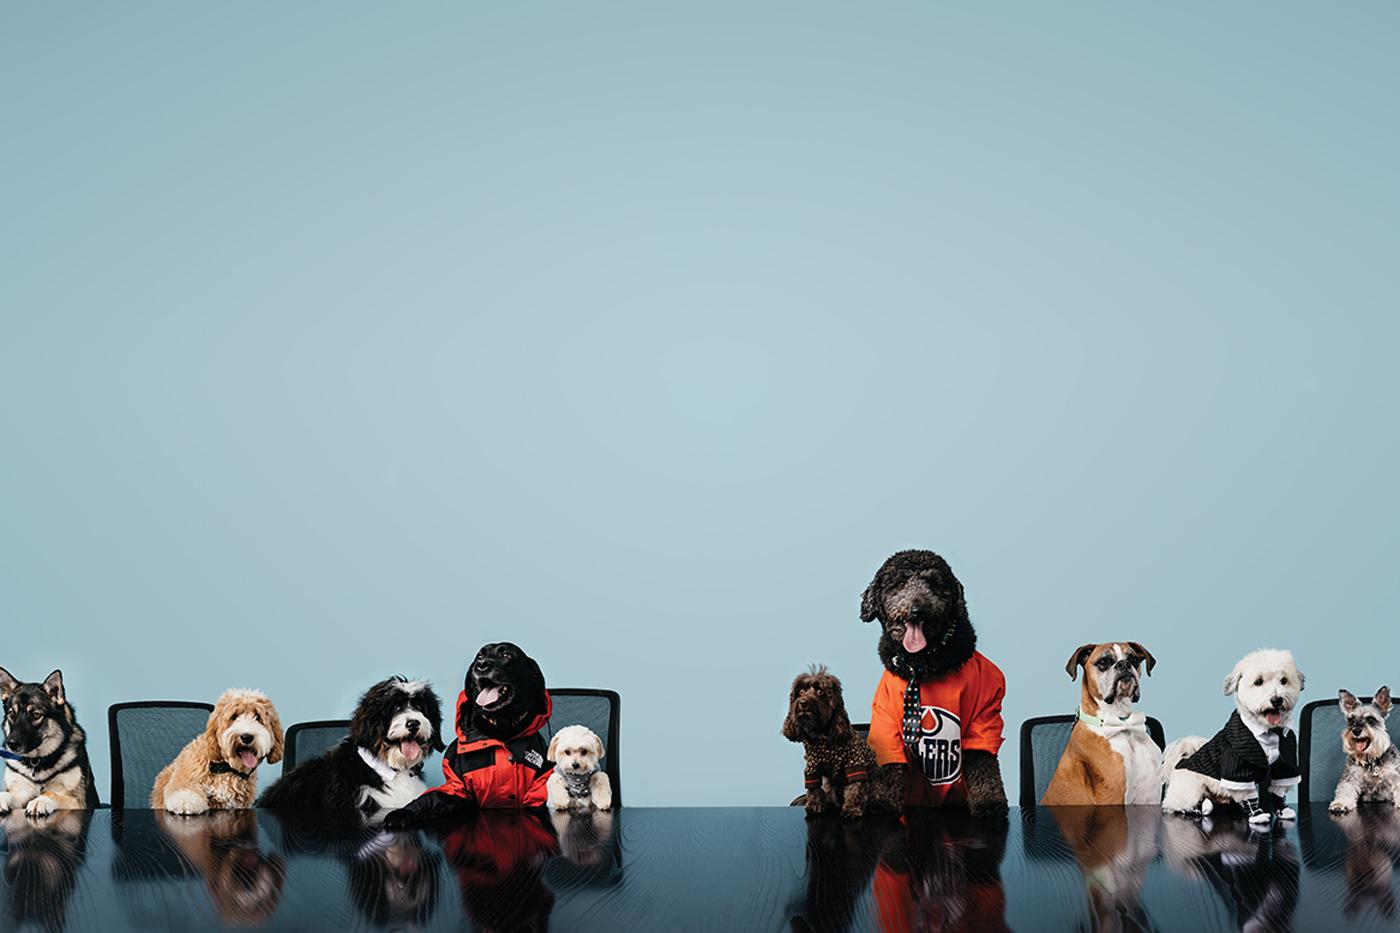 DogsCrop